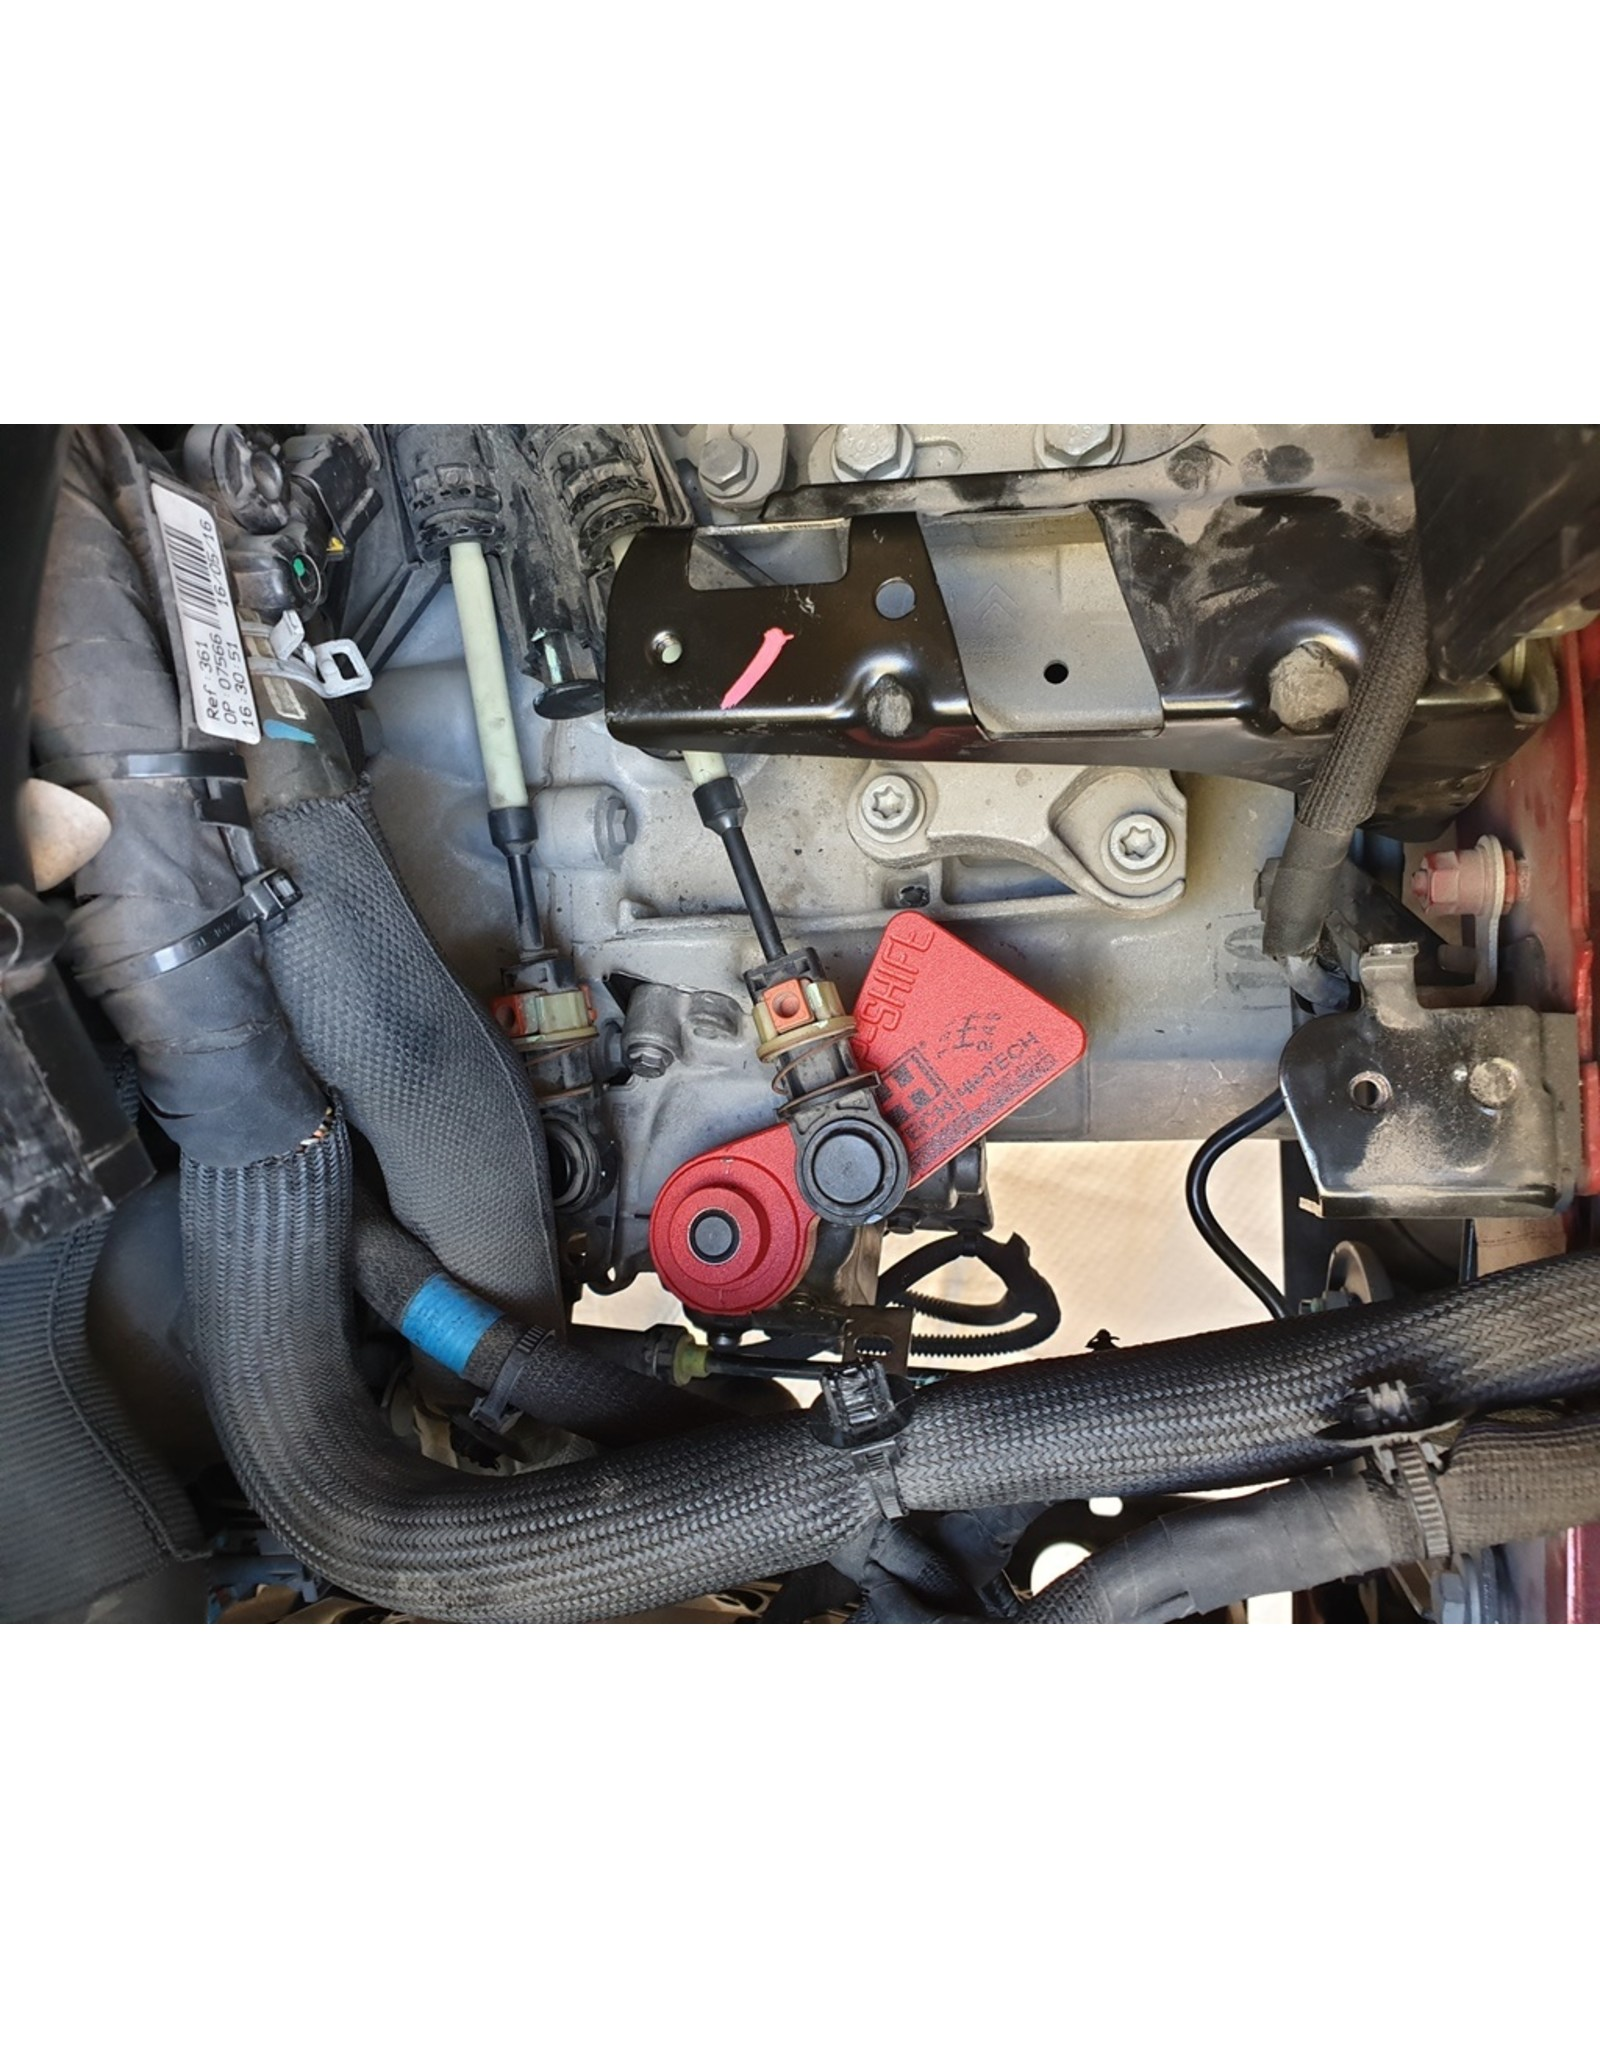 4H-TECH P-Shift Short Shifter for 1.6 THP 16V